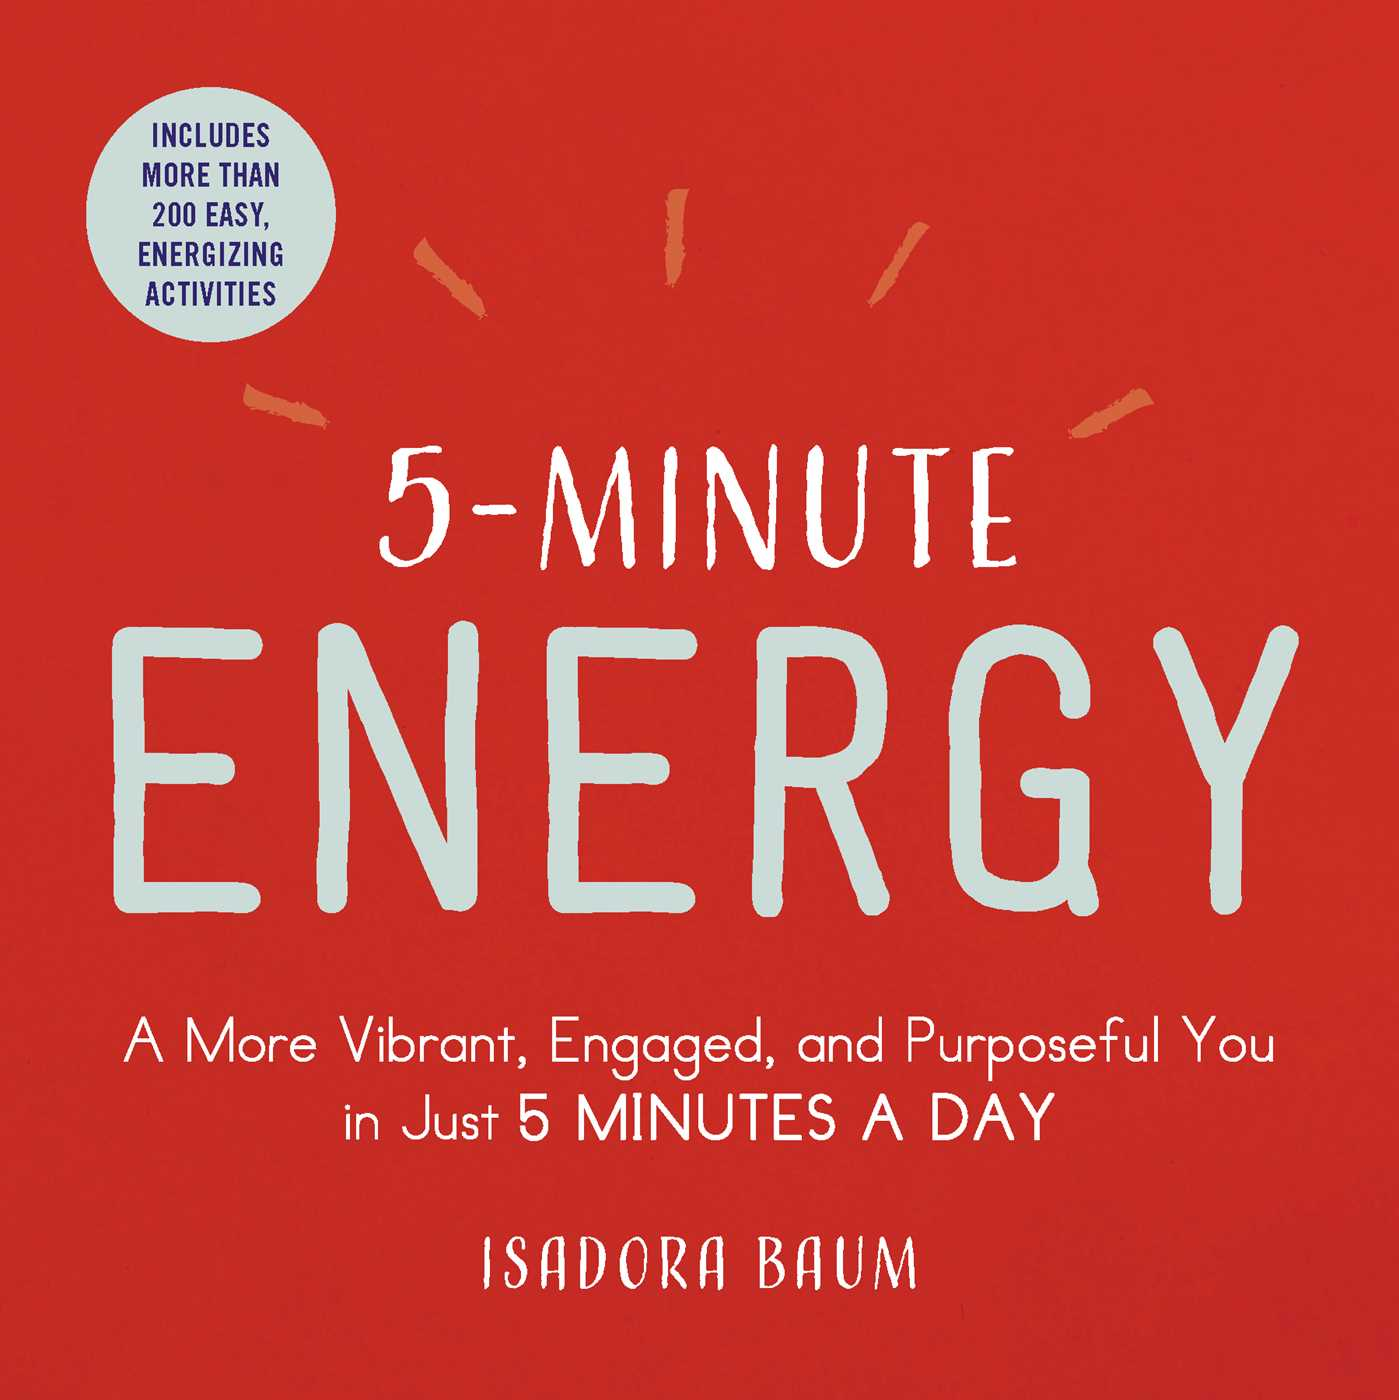 5 minute energy 9781507208823 hr